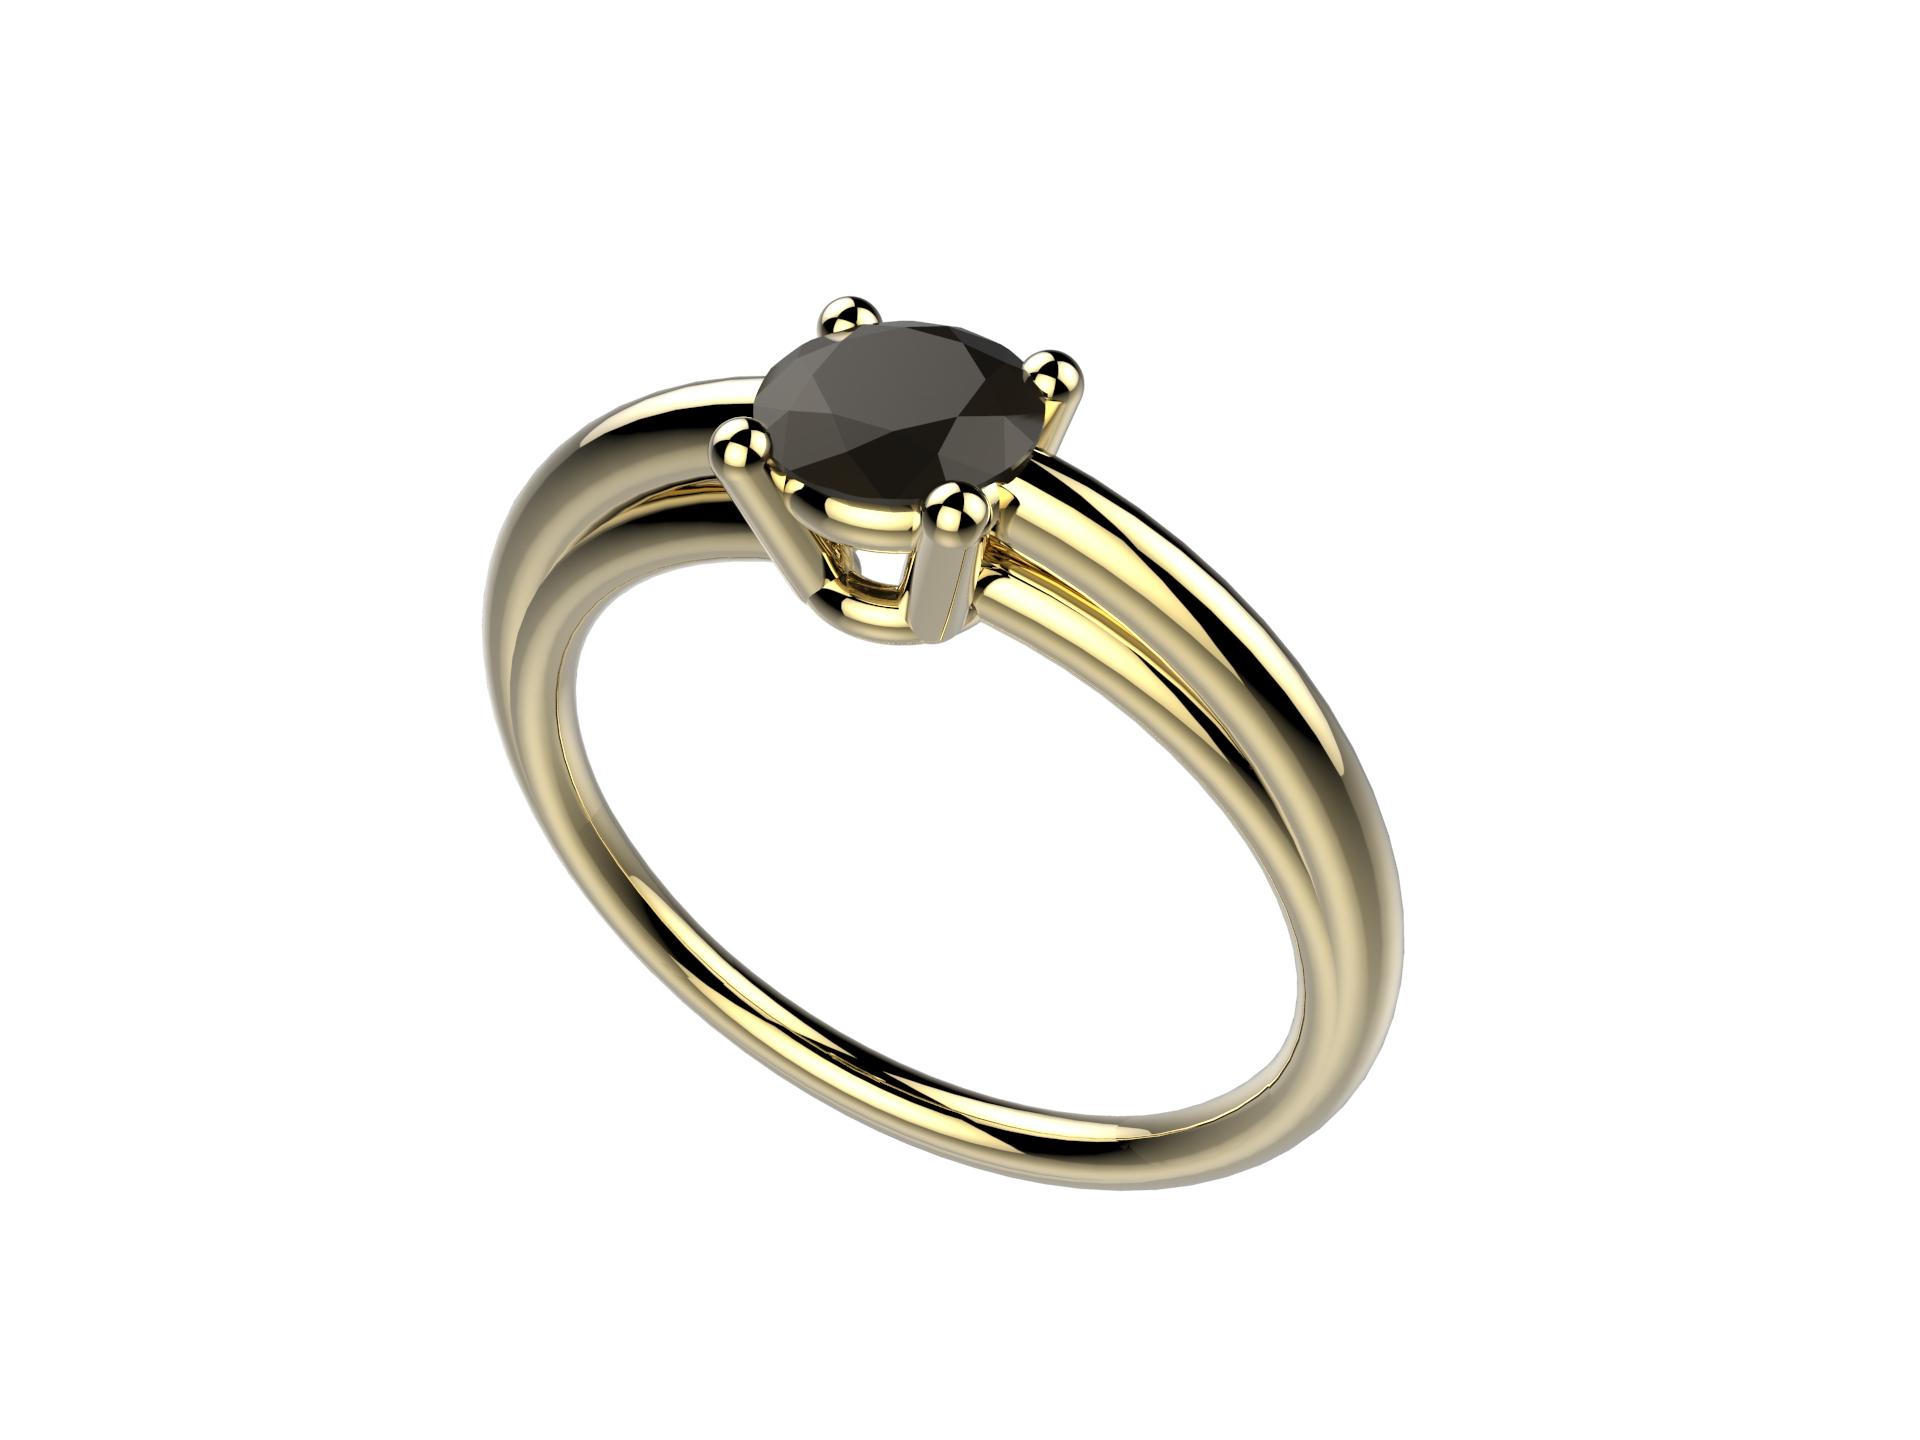 Bague or jaune diamant noir 1830 €